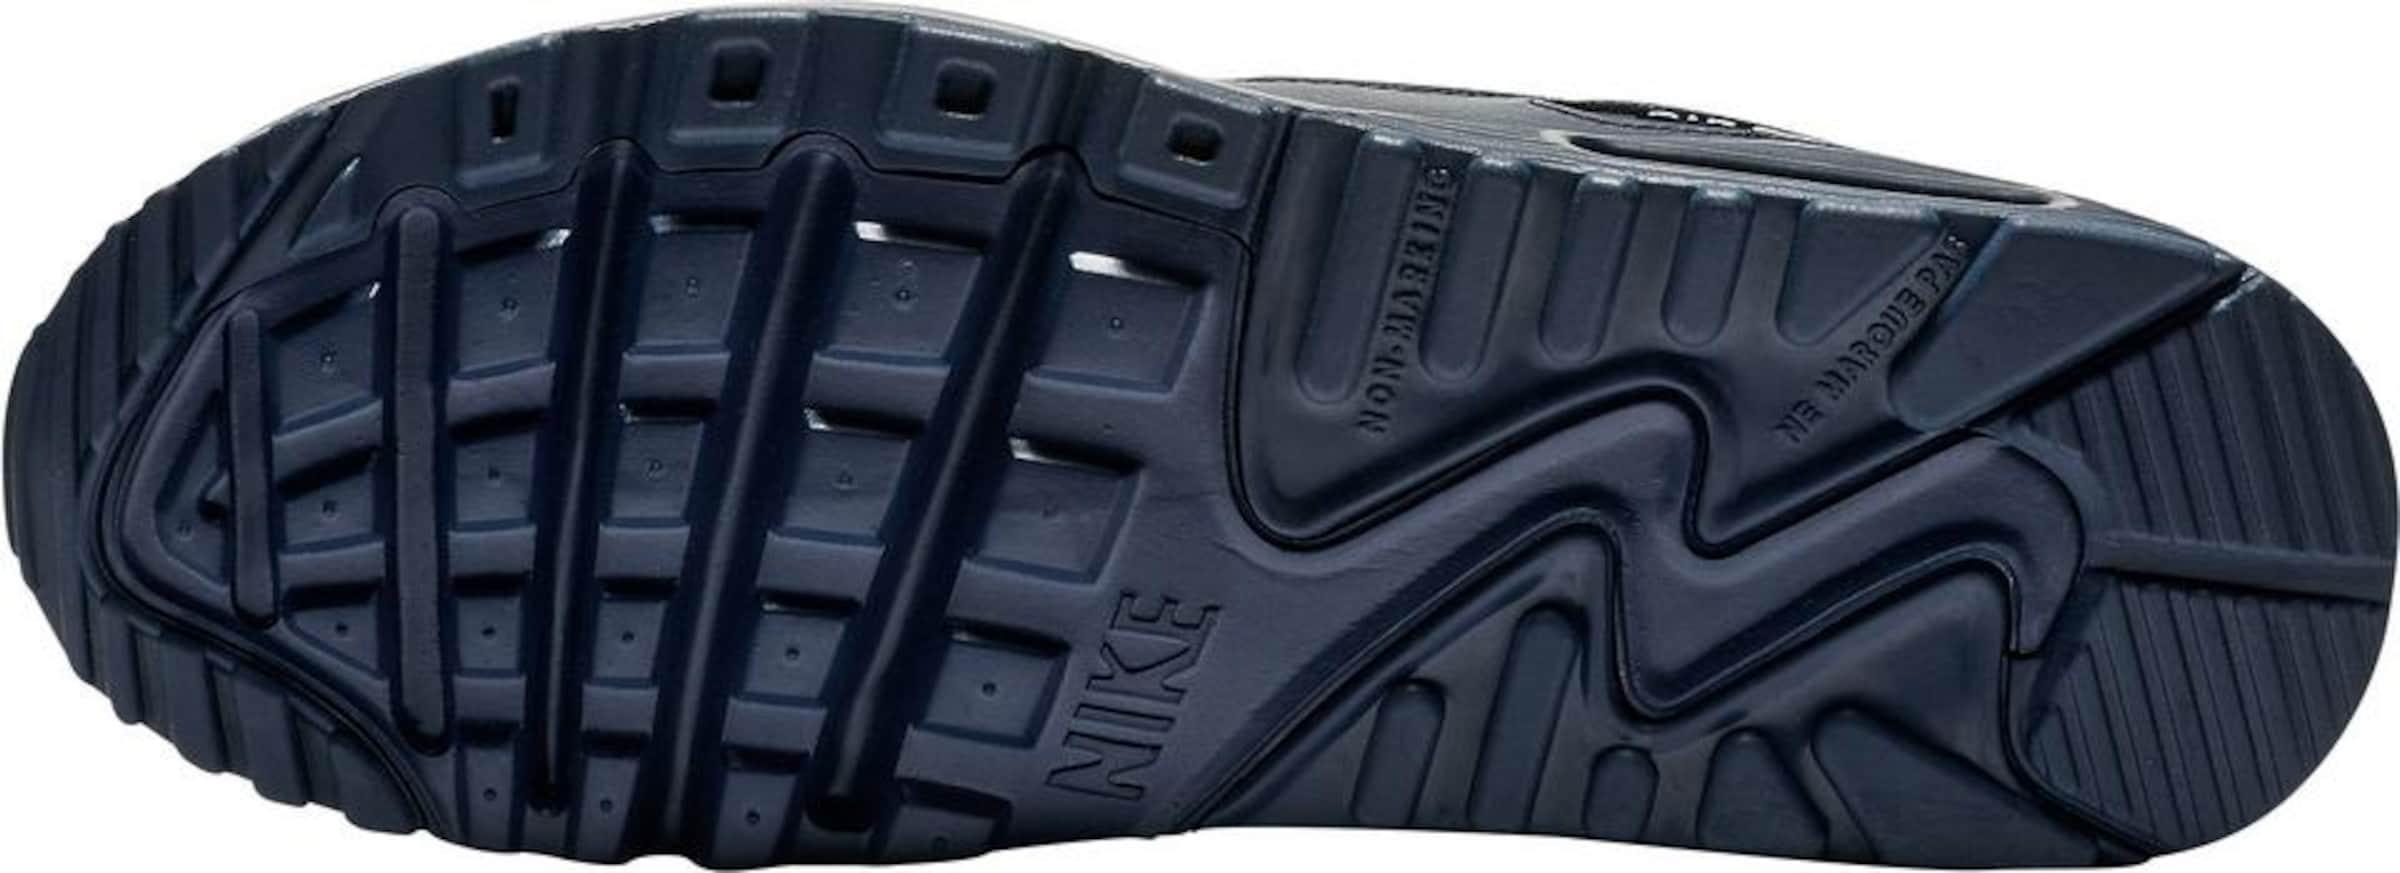 Bg' Navy Sportswear Sneaker Max Nike 90 In 'air Ltr KJ3T1Fcl